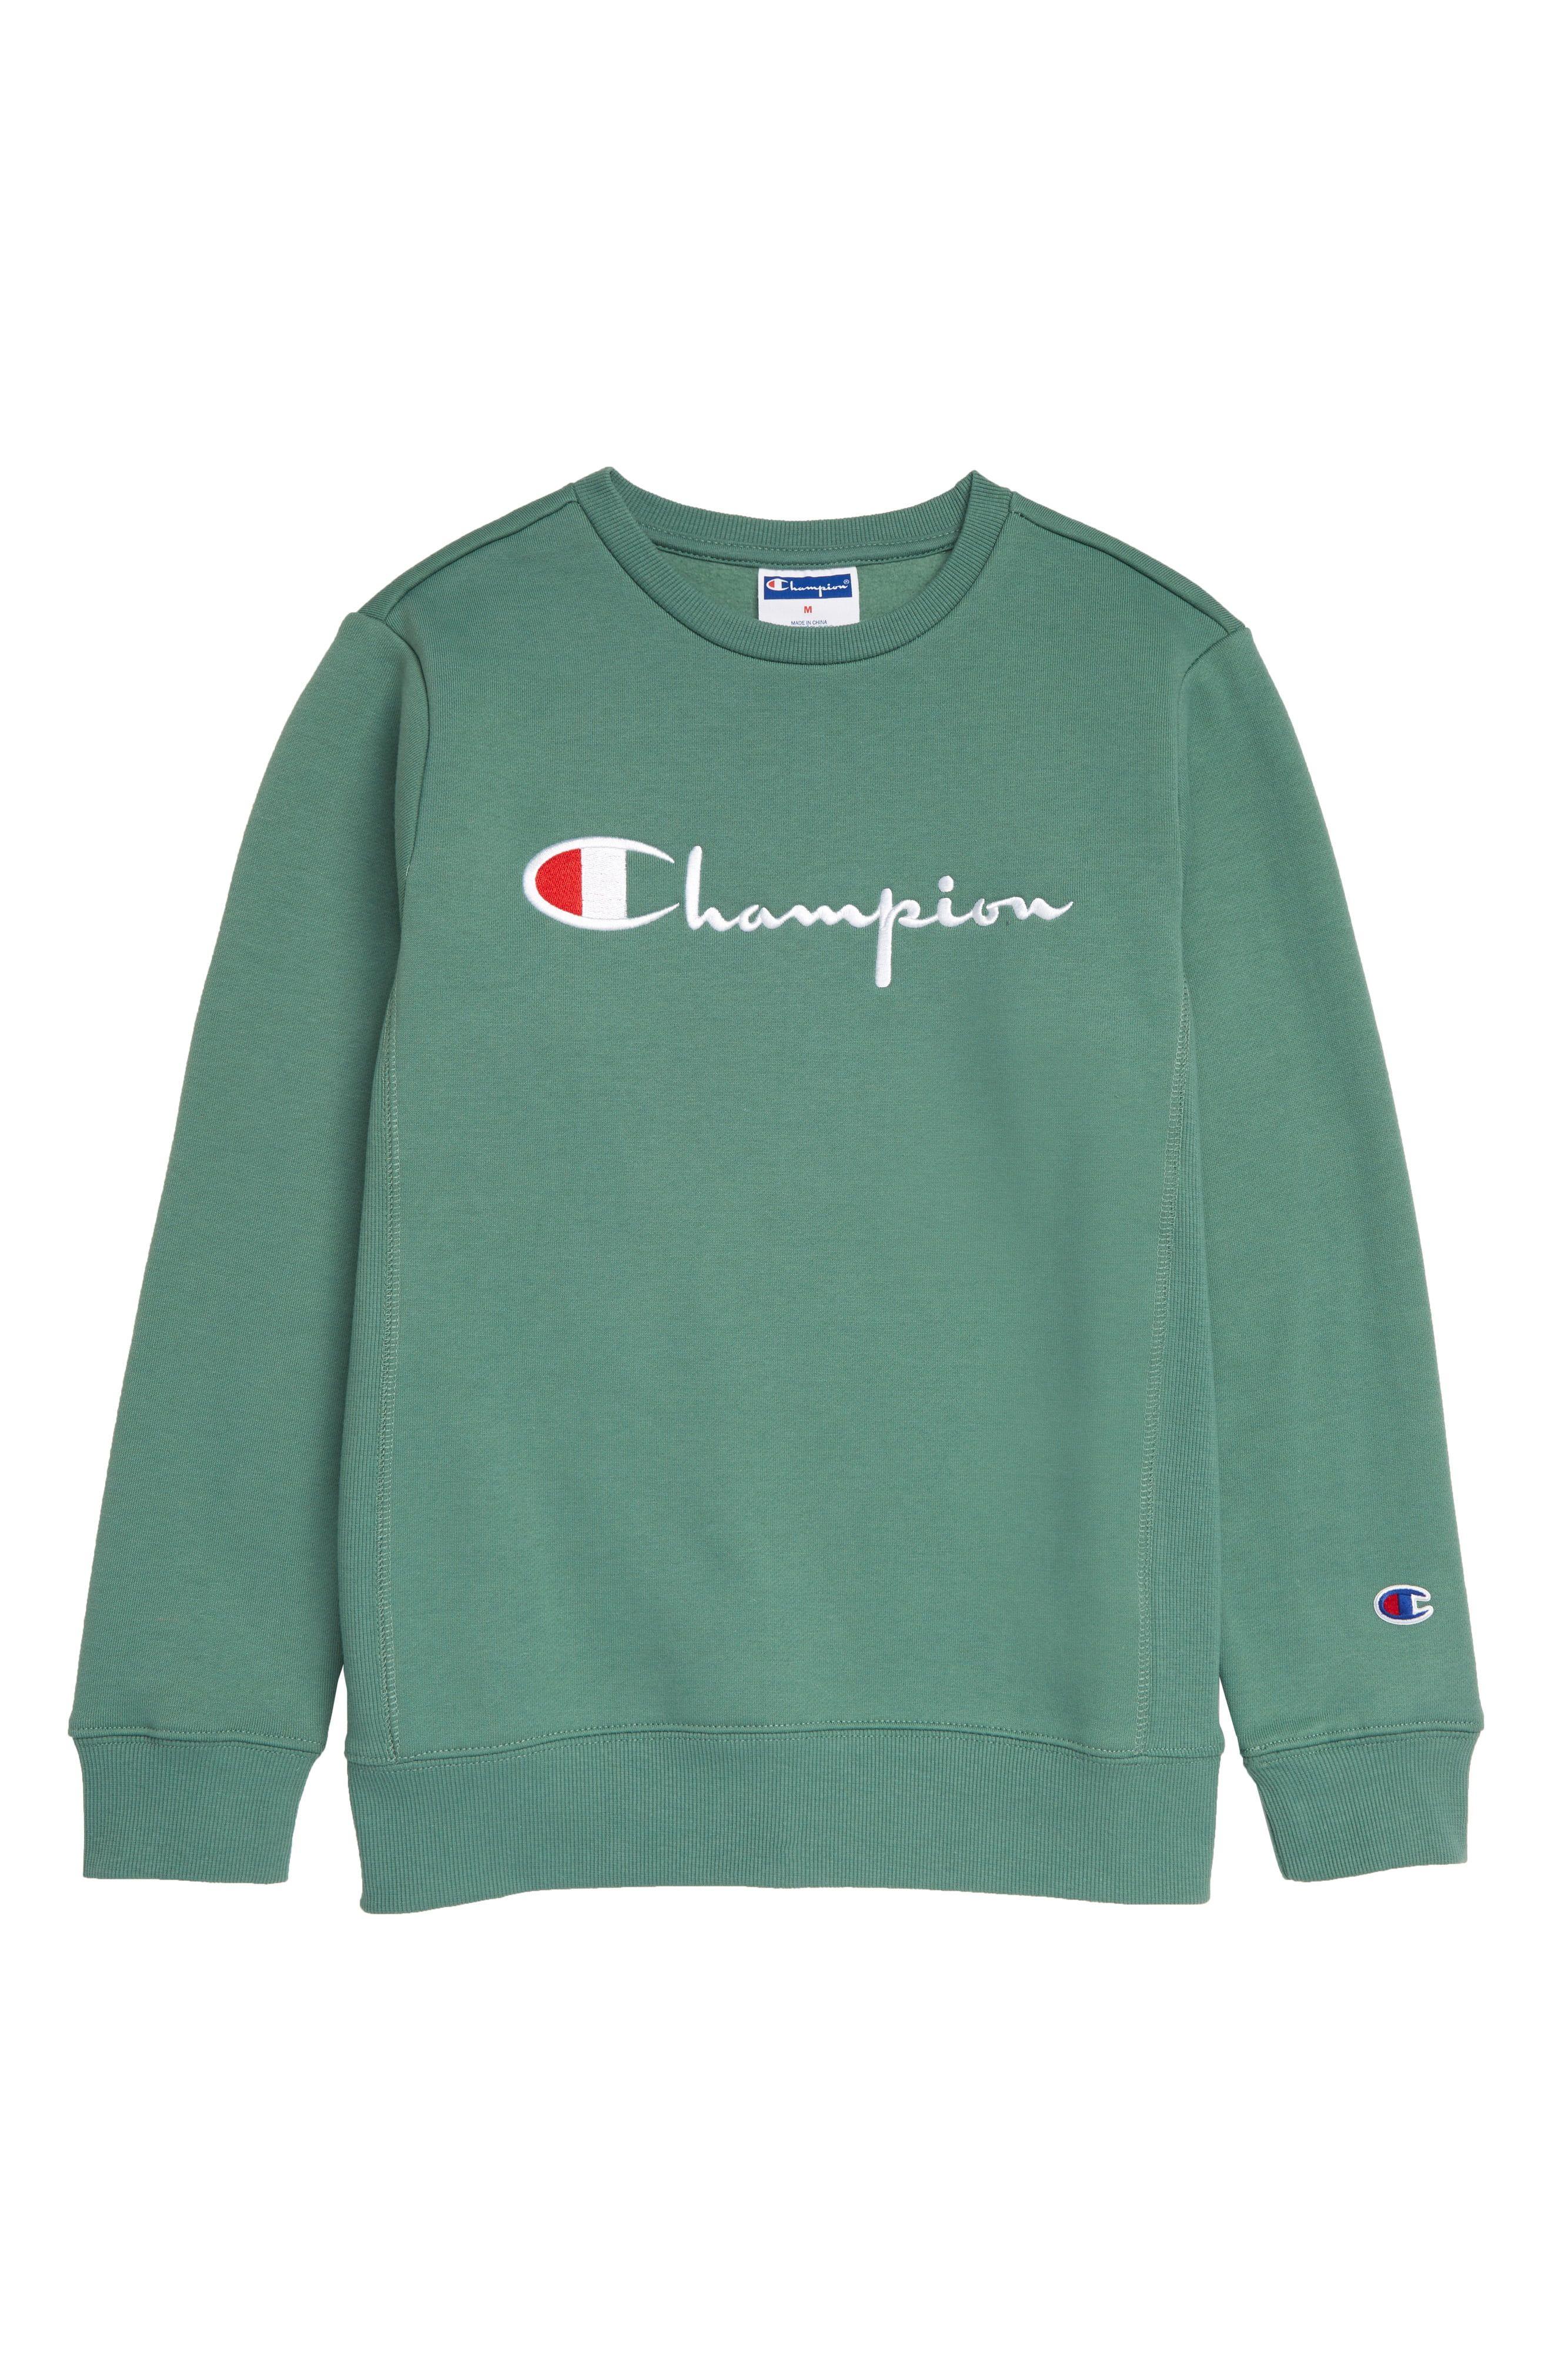 Champion Heritage Embroidered Premium Fleece Sweatshirt Available At Nordstrom Sweatshirt Fleece Sweatshirts Fleece [ 4048 x 2640 Pixel ]